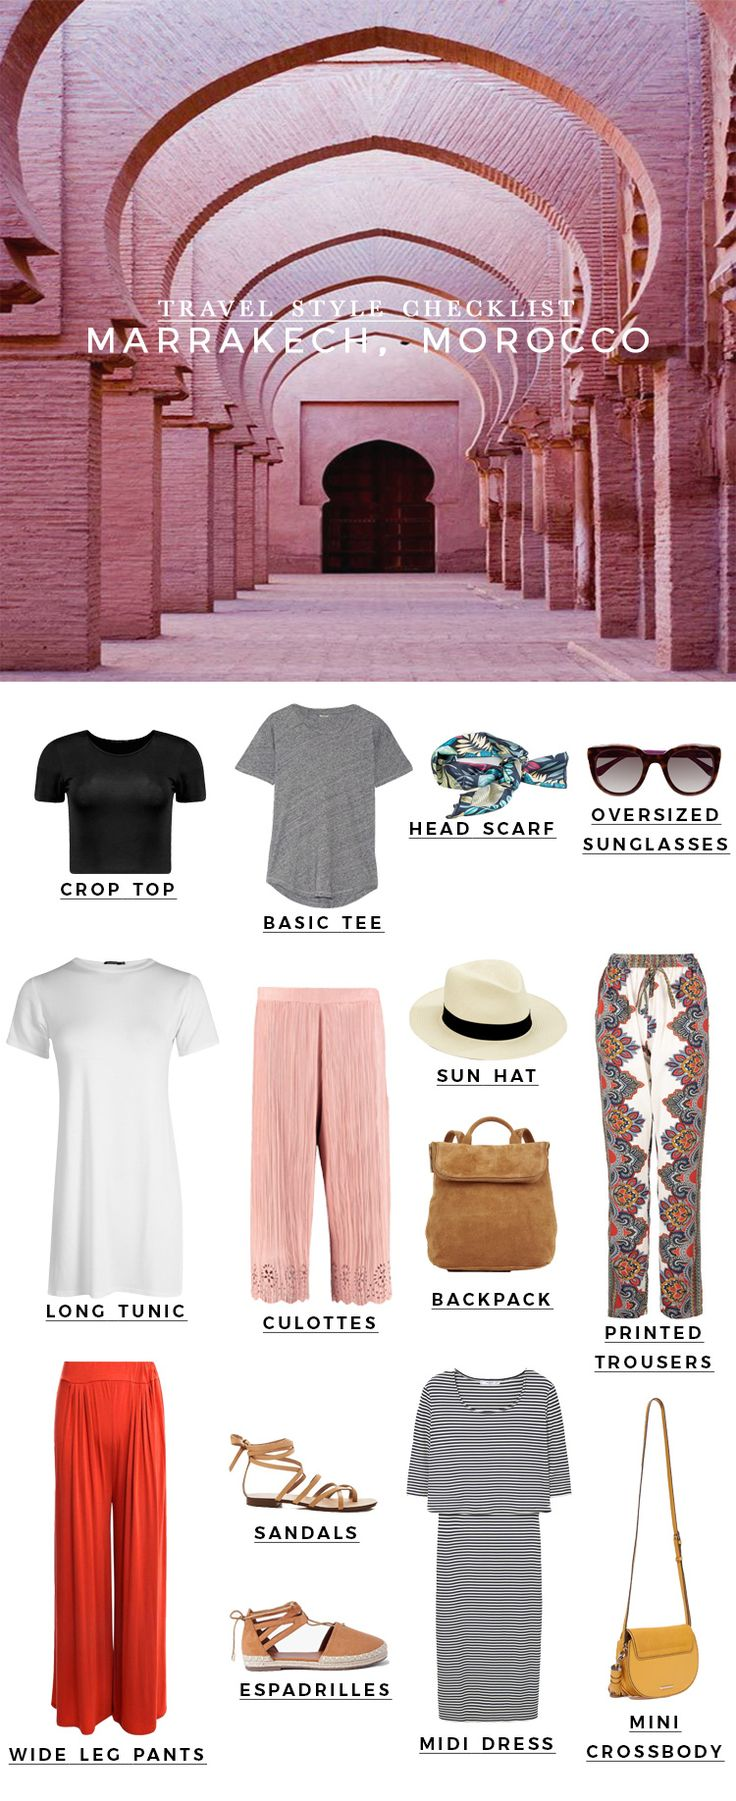 Travel style checklist: 4 days in Marrakech, Morocco